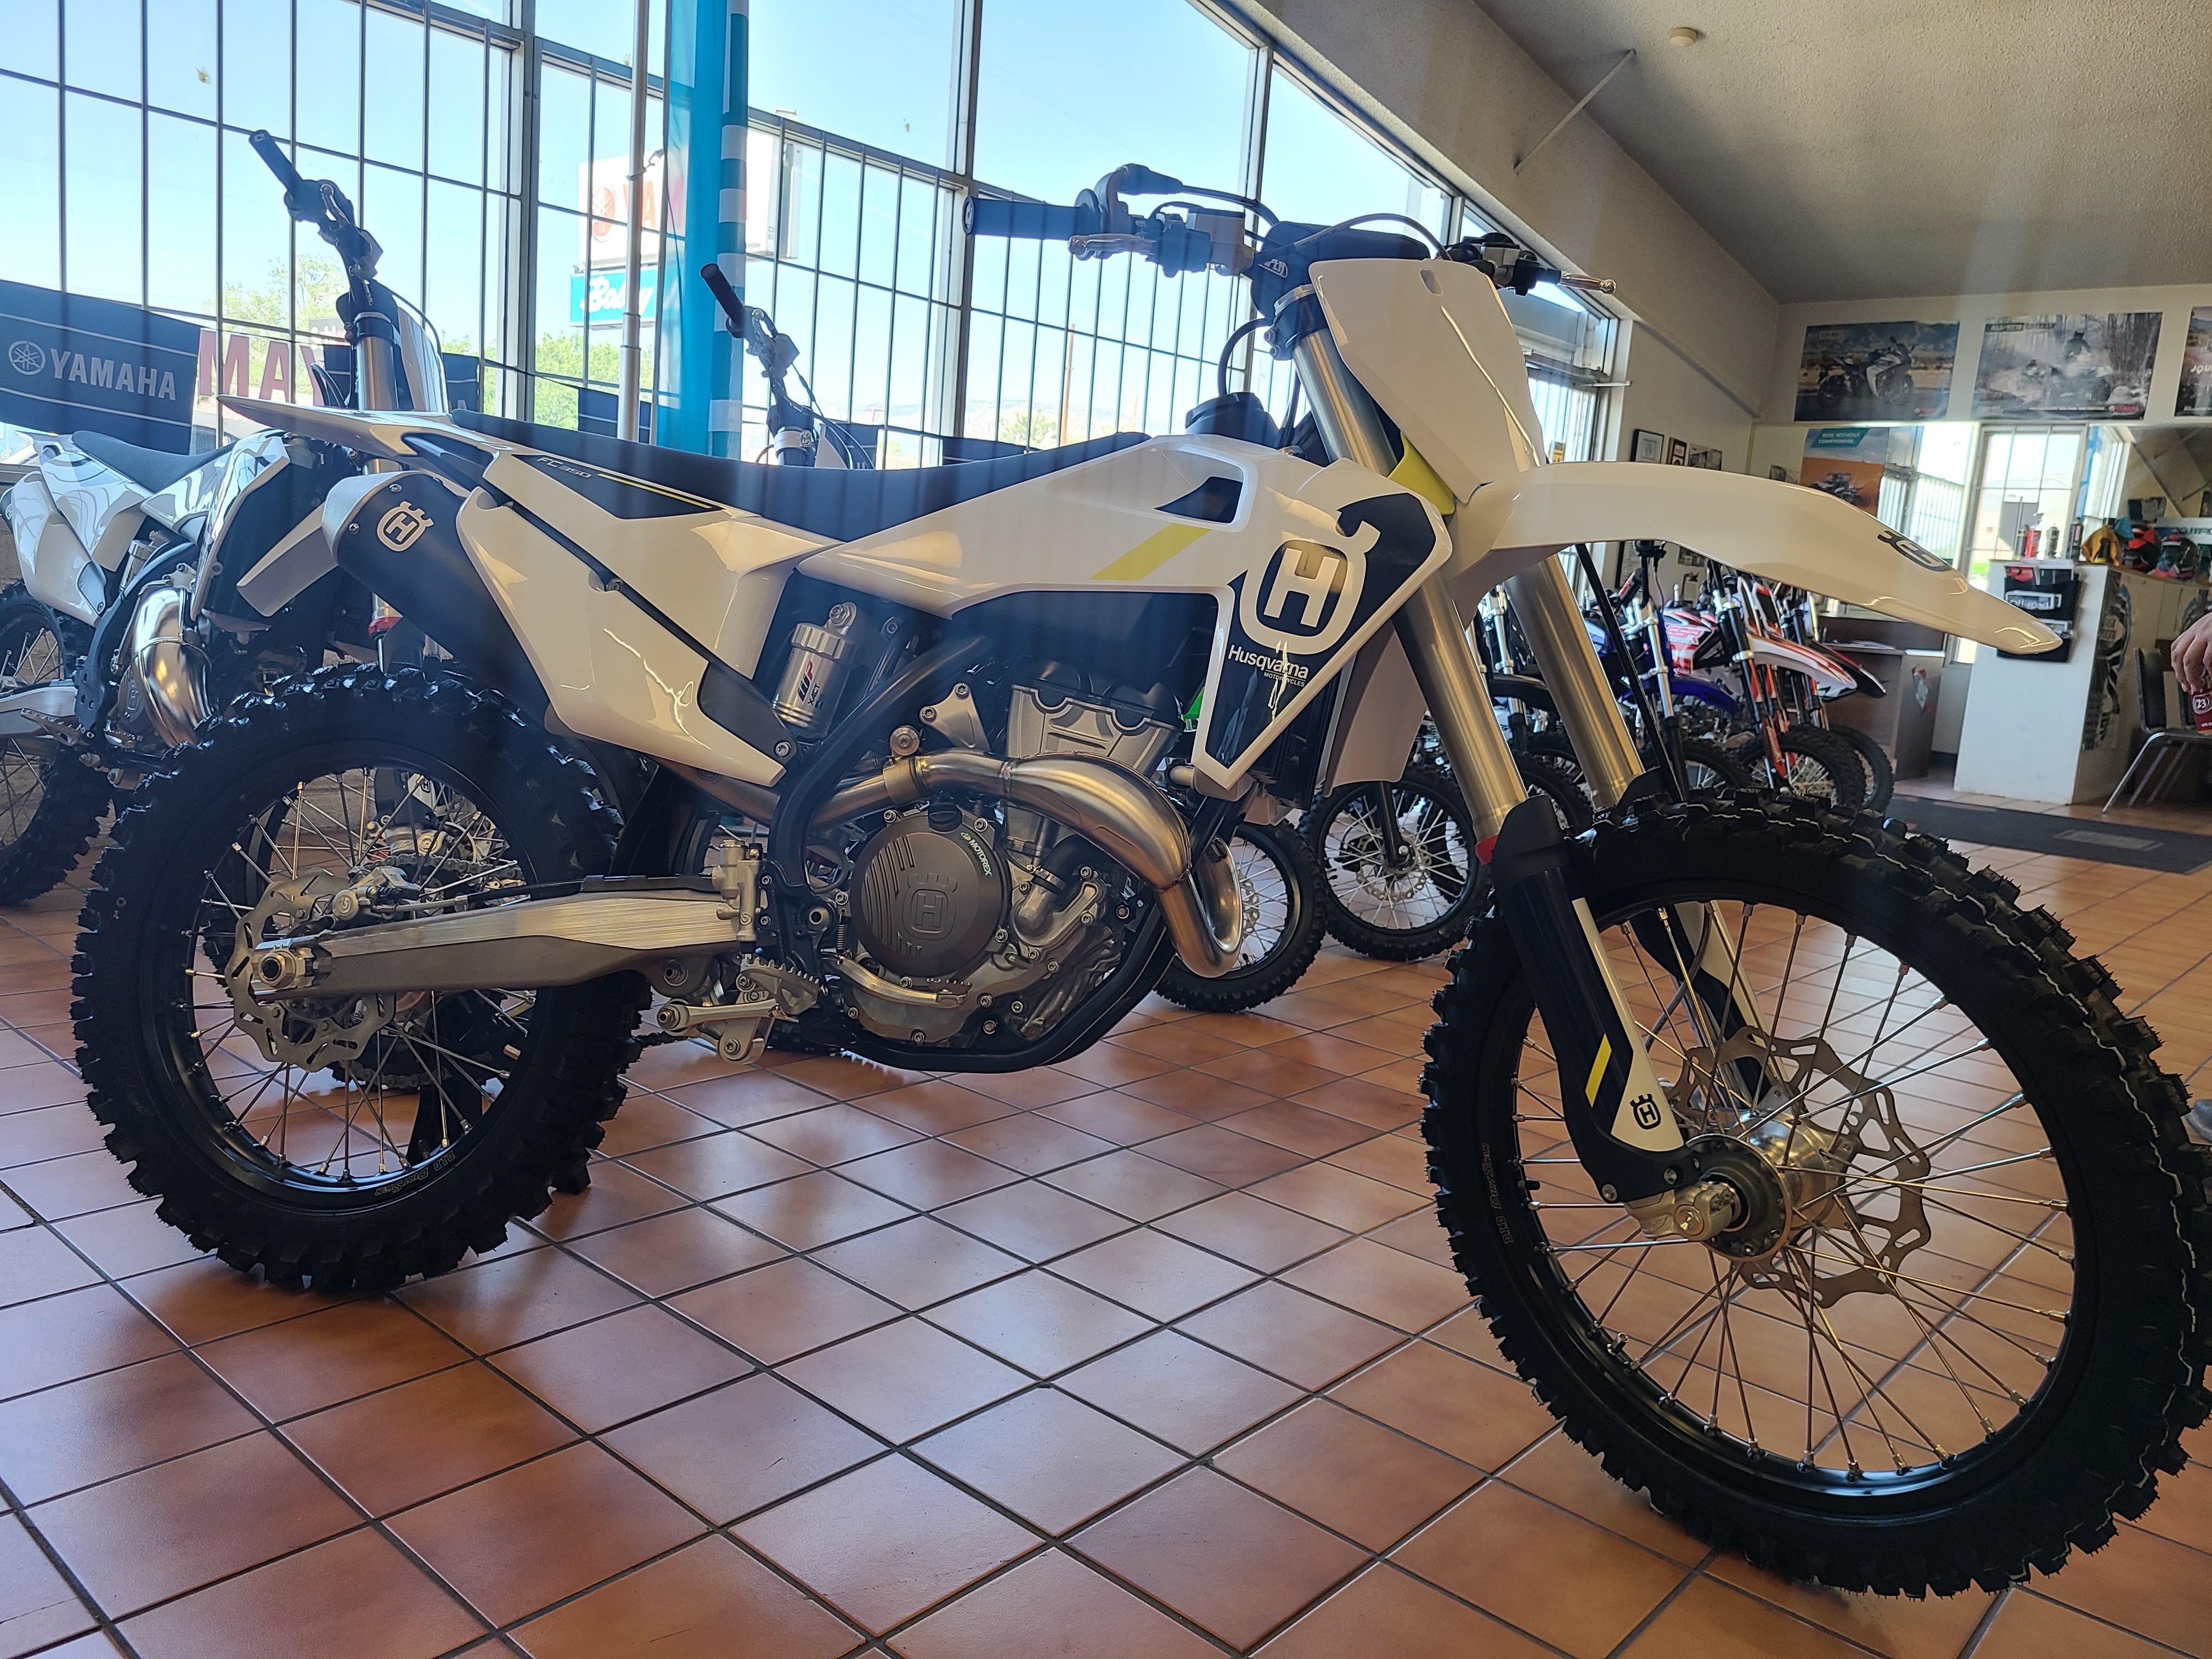 2021 Husqvarna FC 350 at Bobby J's Yamaha, Albuquerque, NM 87110